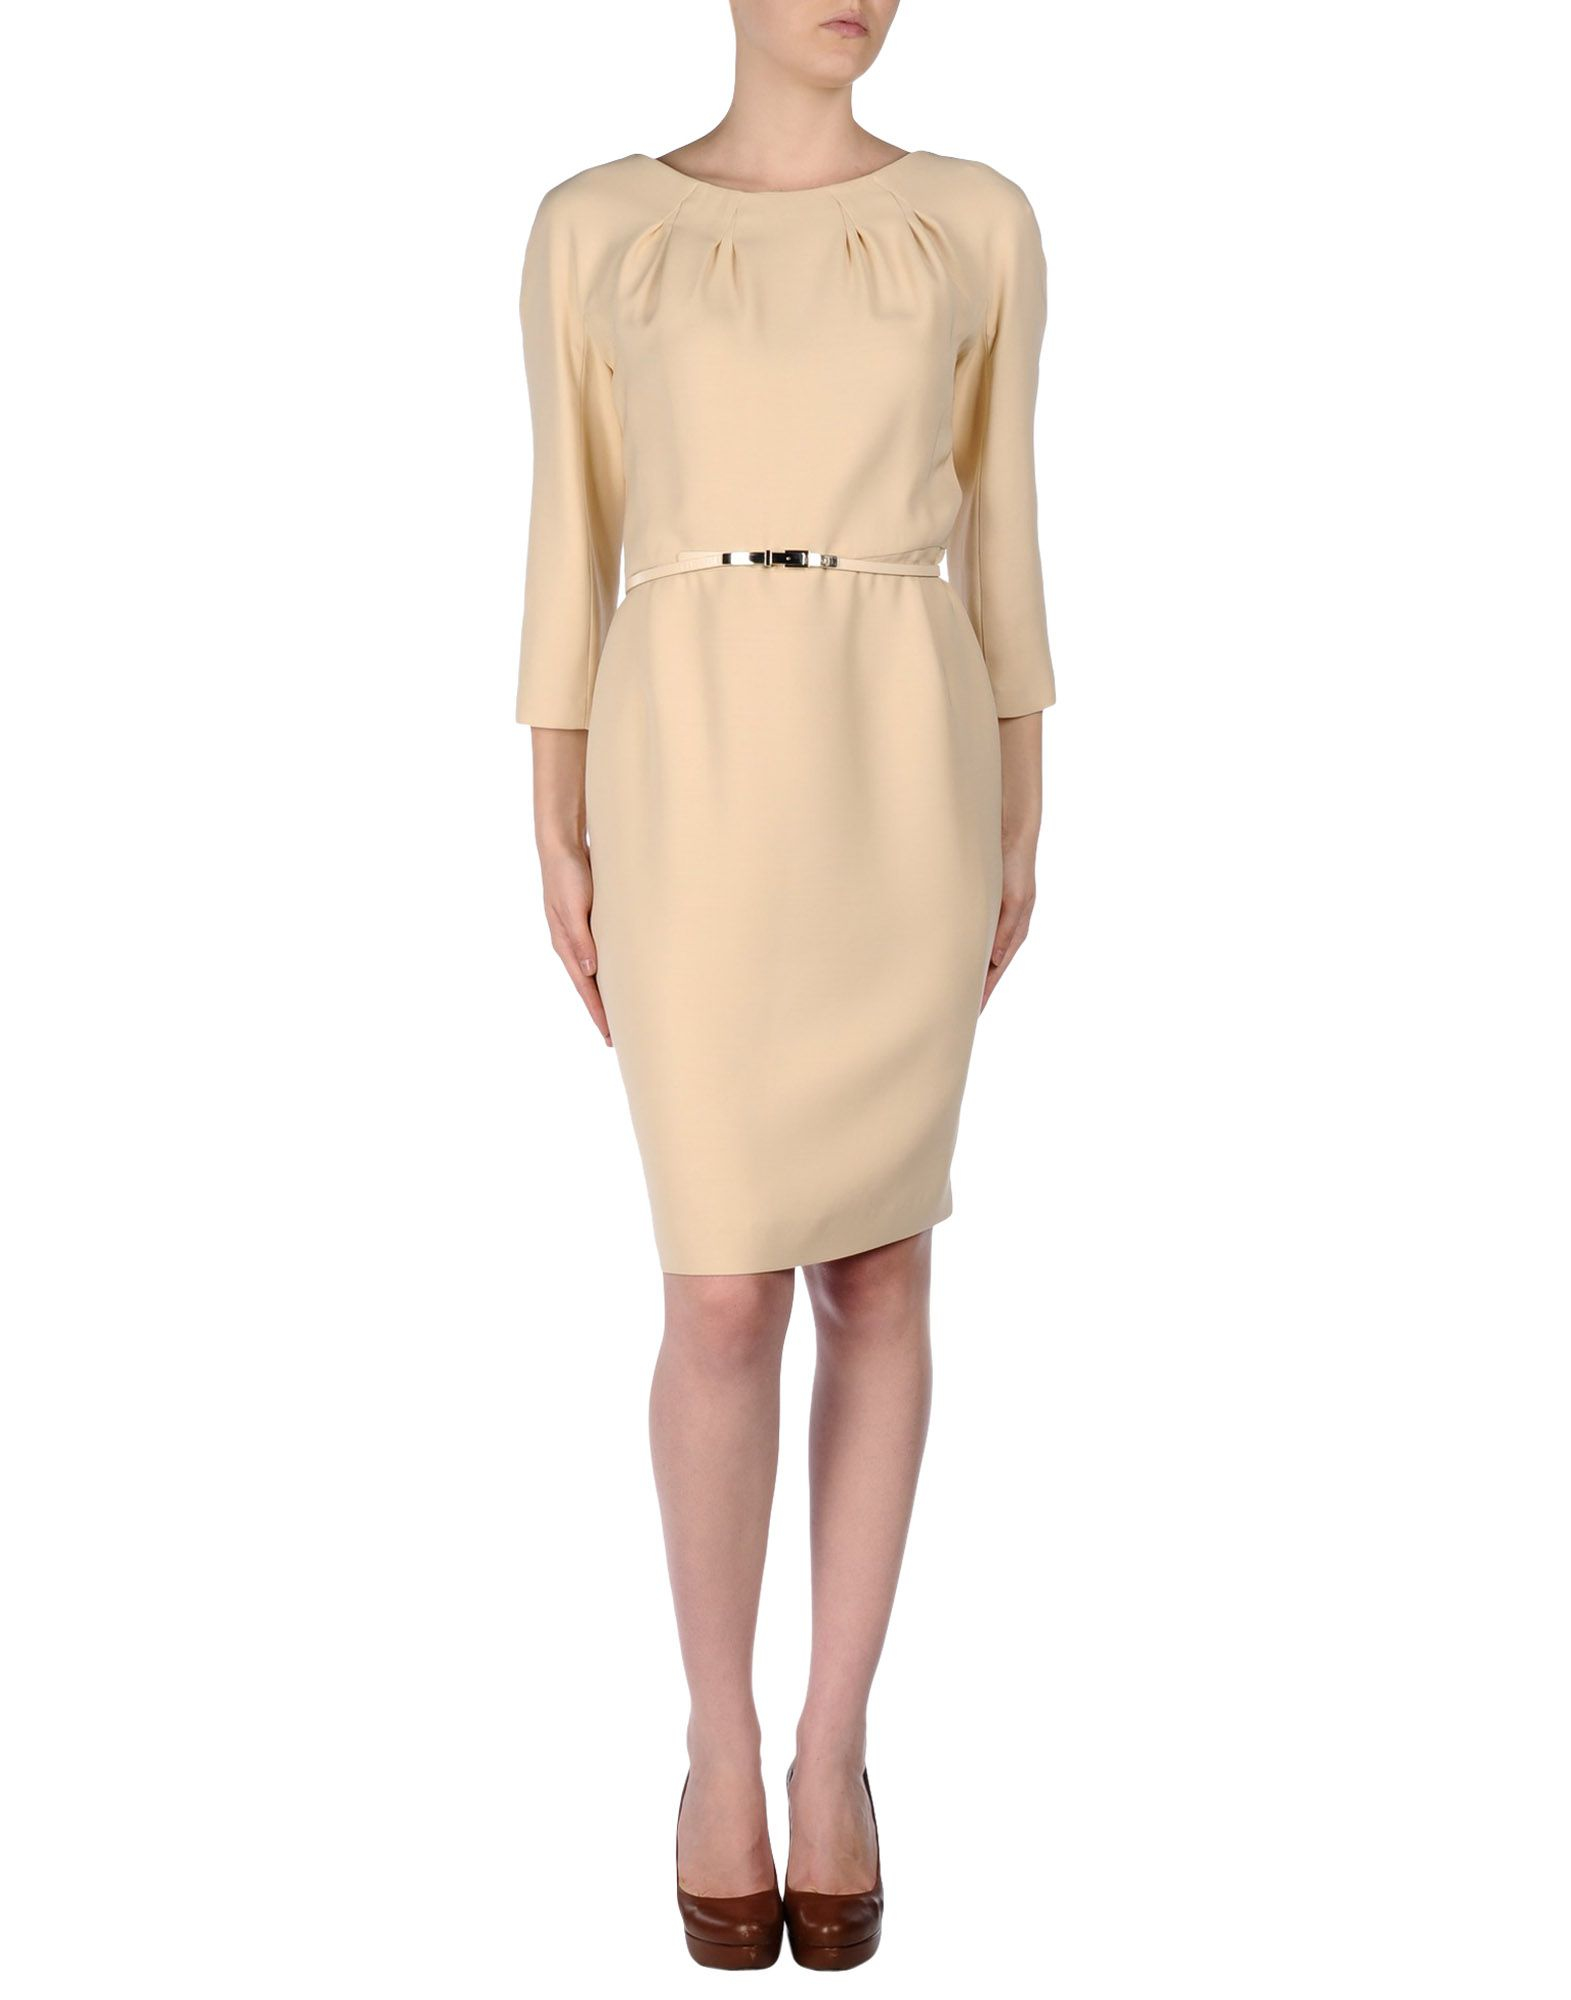 dior short dresses - photo #40